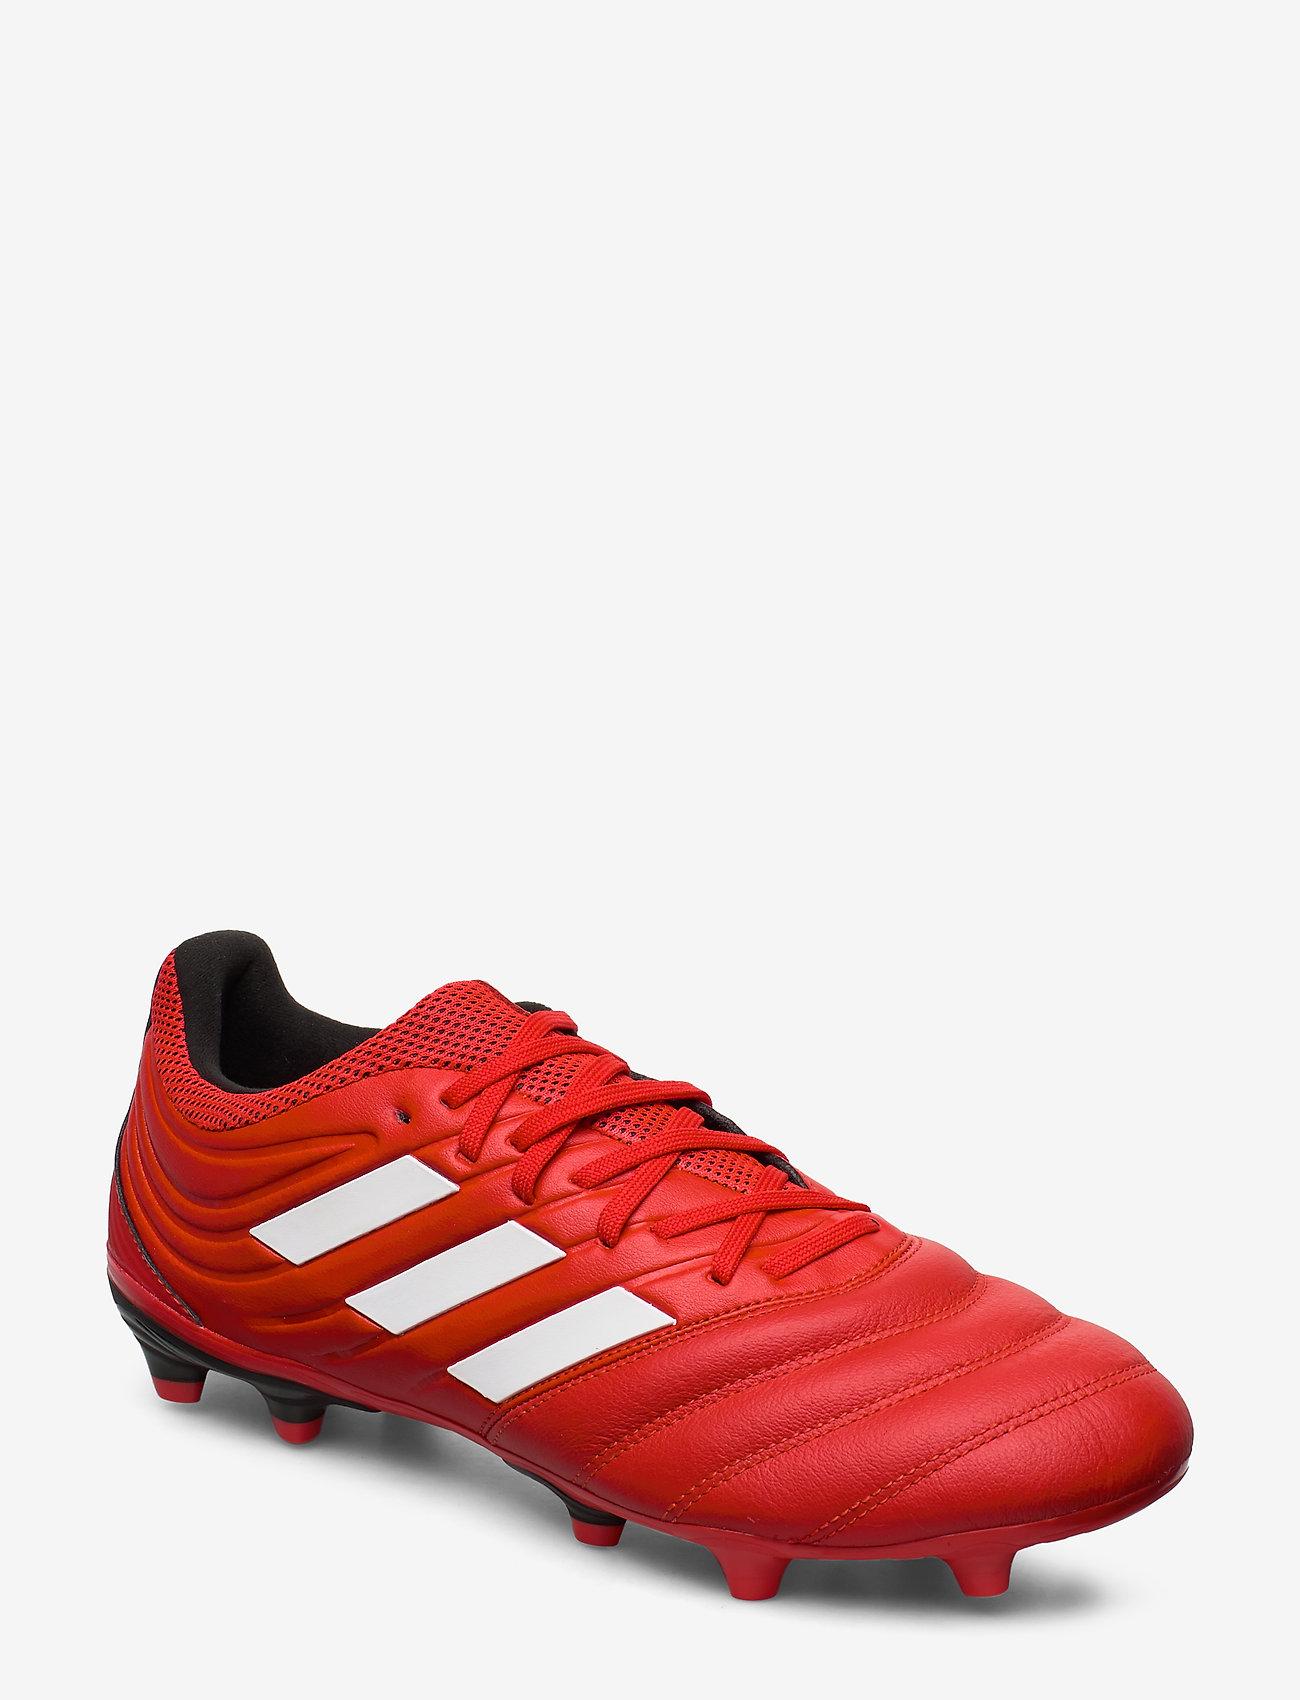 adidas Performance - COPA 20.3 FG - fotbollsskor - actred/ftwwht/cblack - 1